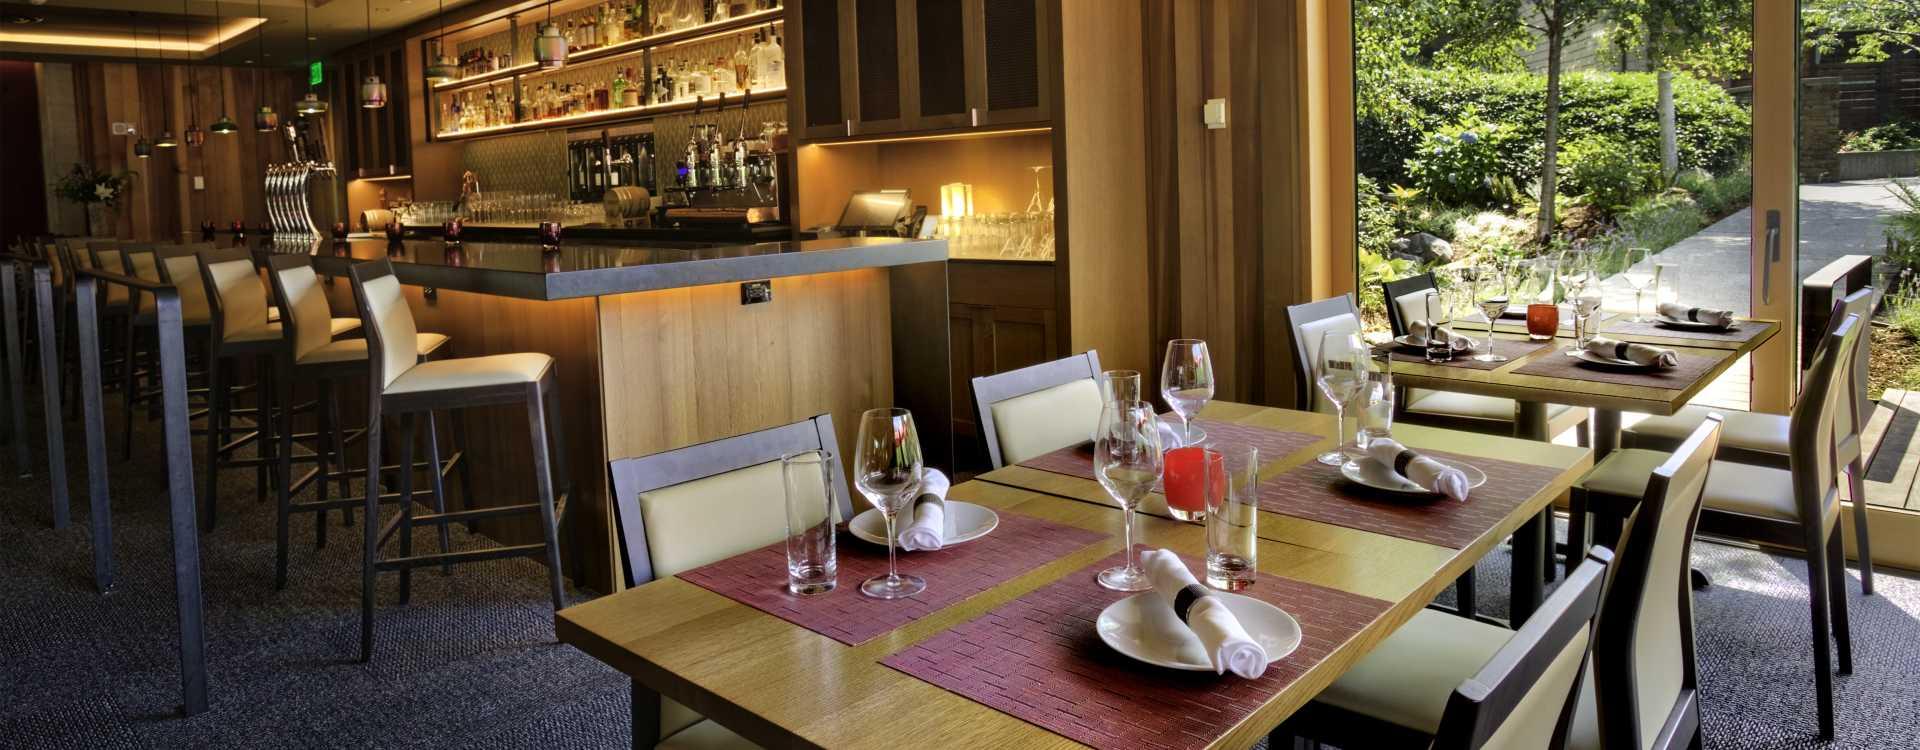 Copperleaf Bar and Terrace Interior